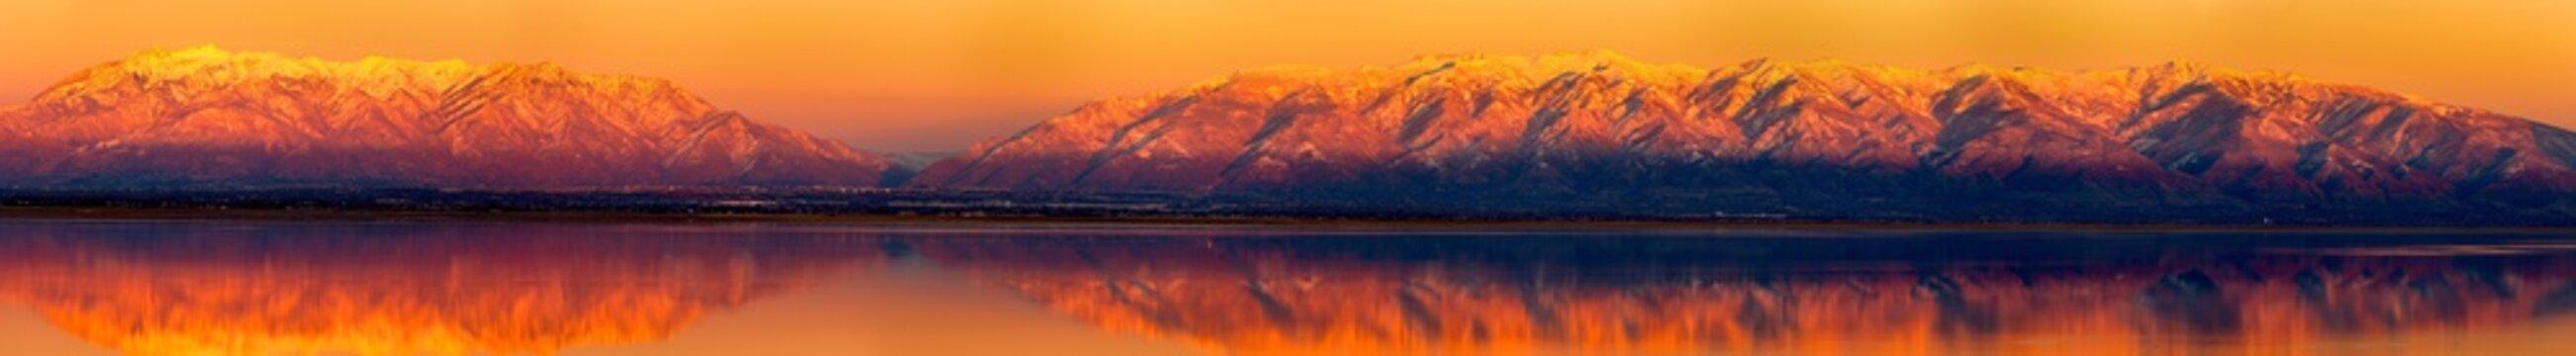 Wasatch Range Sunset from Antelope Island